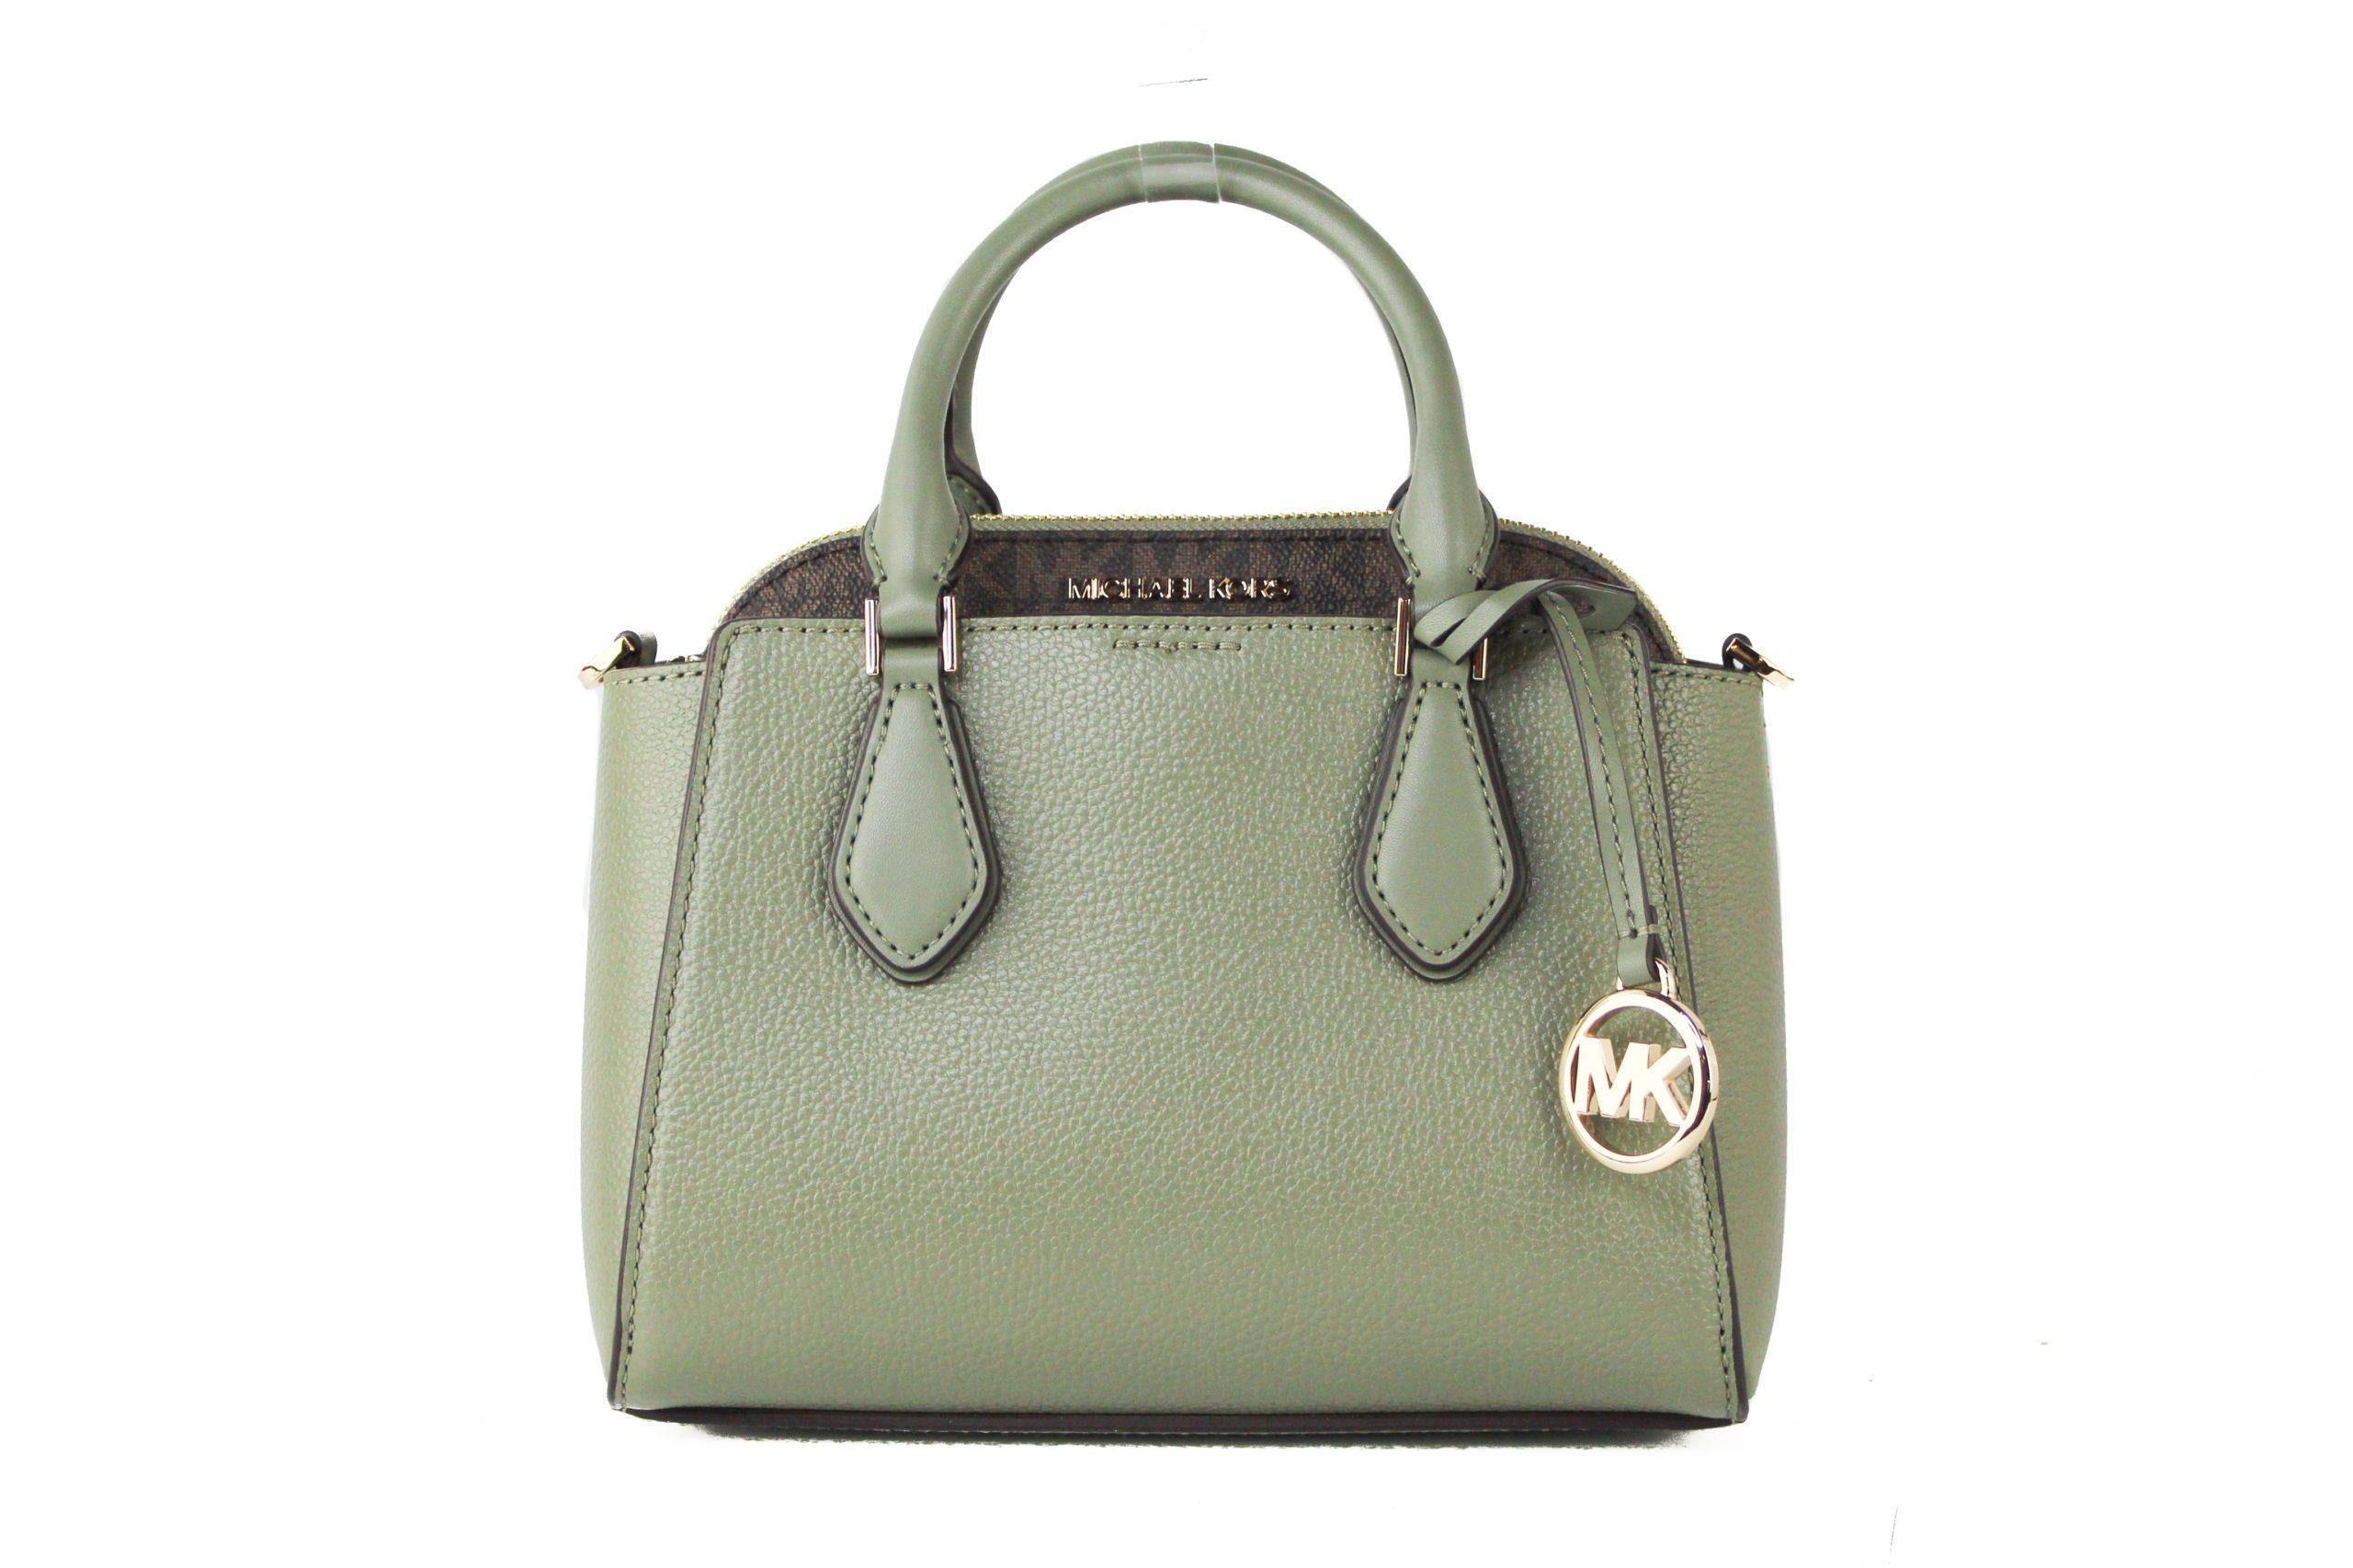 Michael Kors Women's Daria Crossbody Bag Green 23303